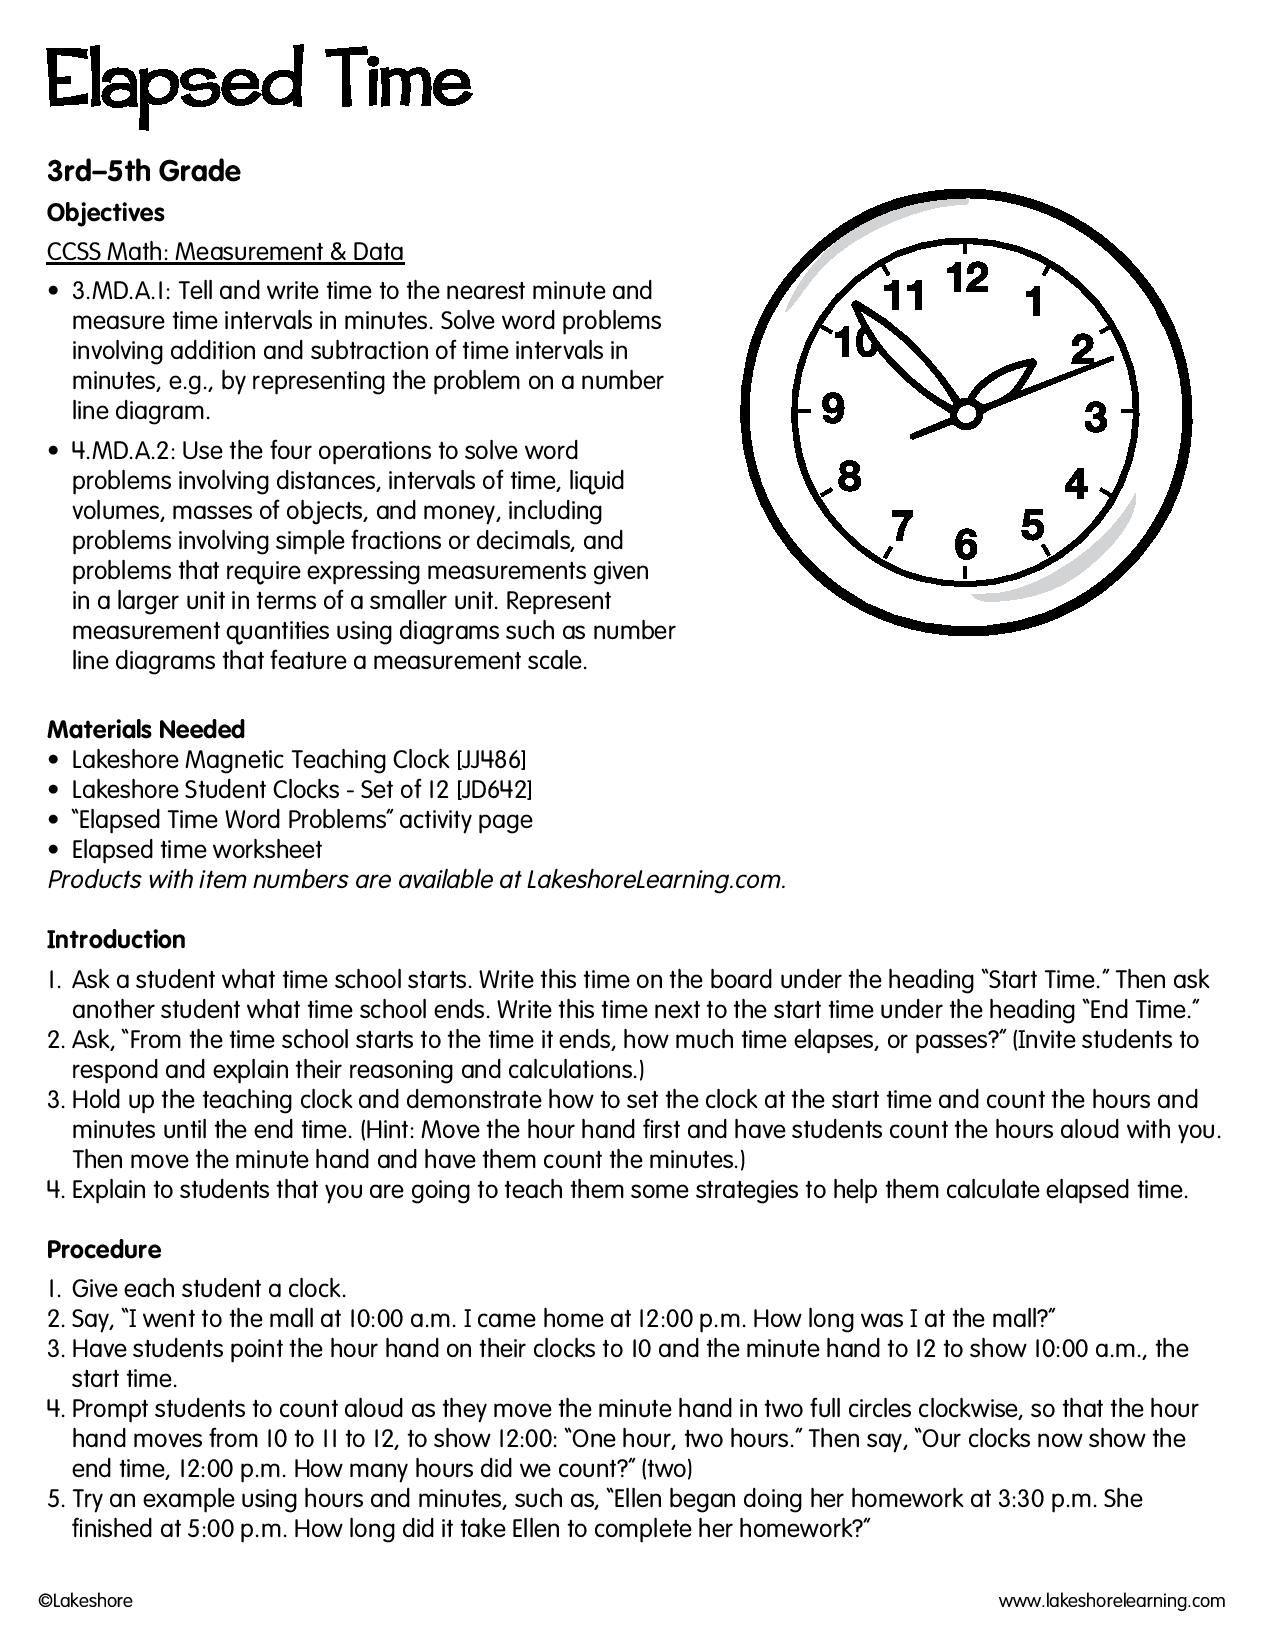 Elapsed Time Lessonplan